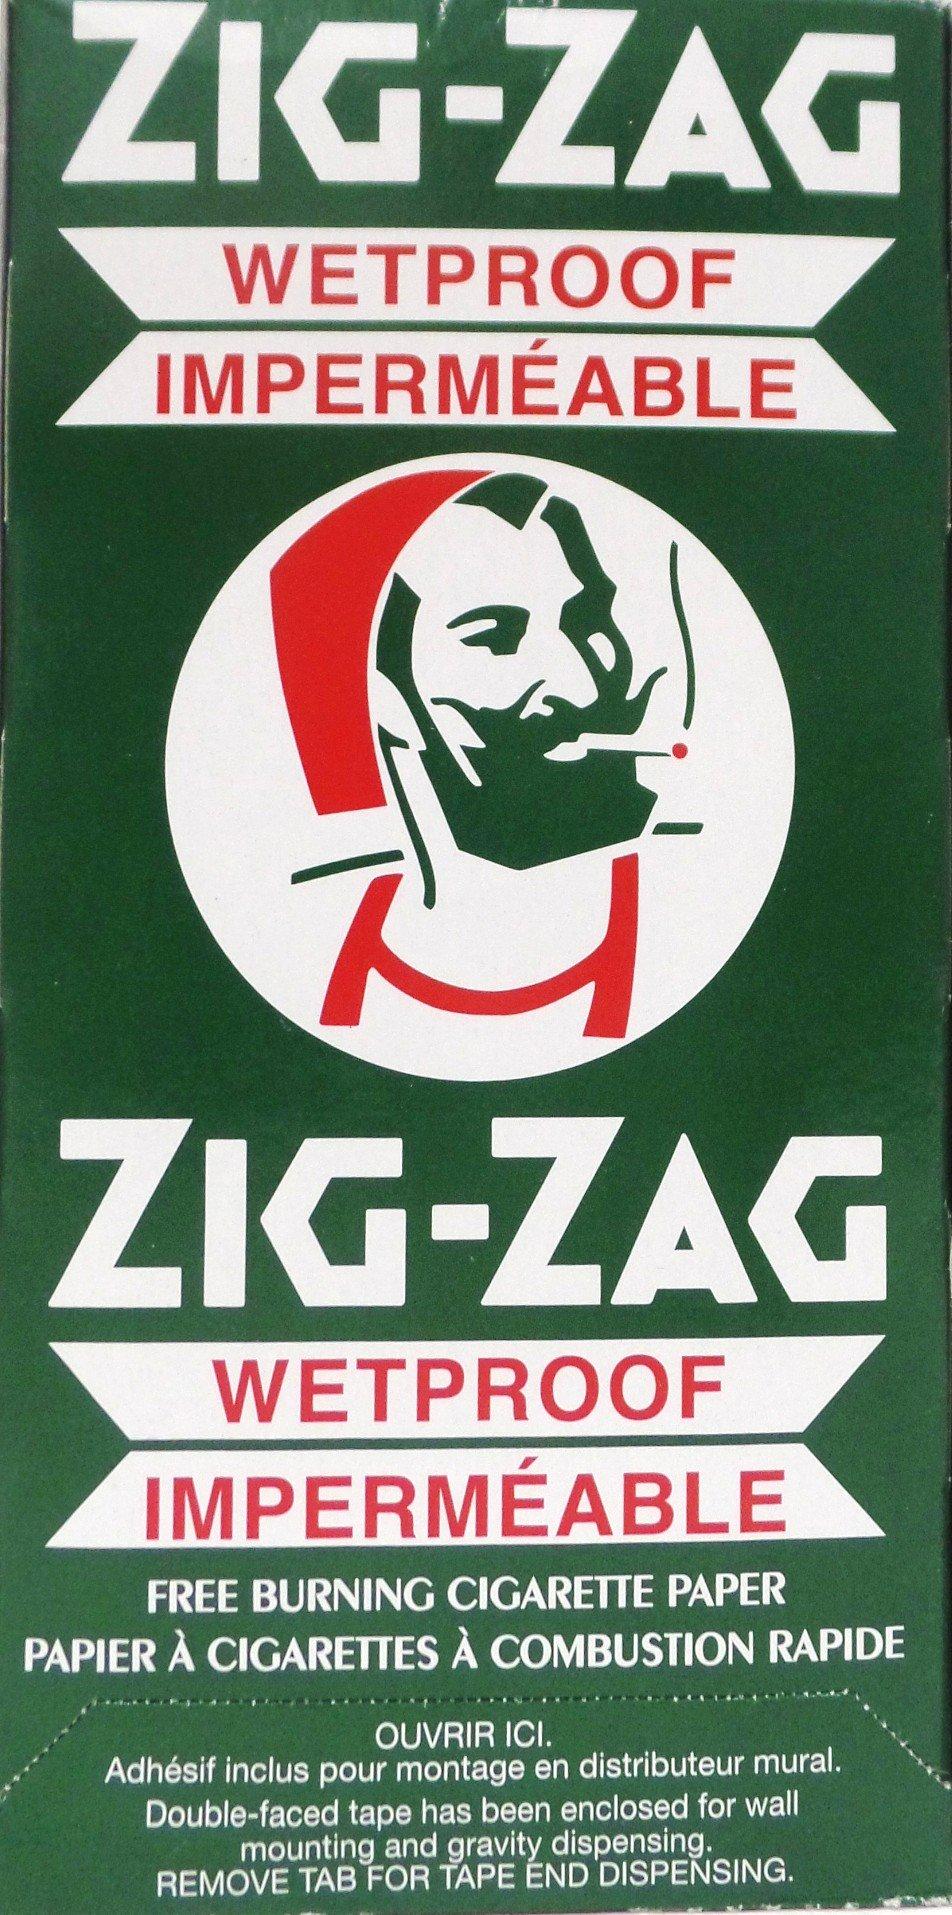 25 Packs Zig Zag Wetproof Cigarette Rolling Papers 100 Leaves/Pack Slow Burning